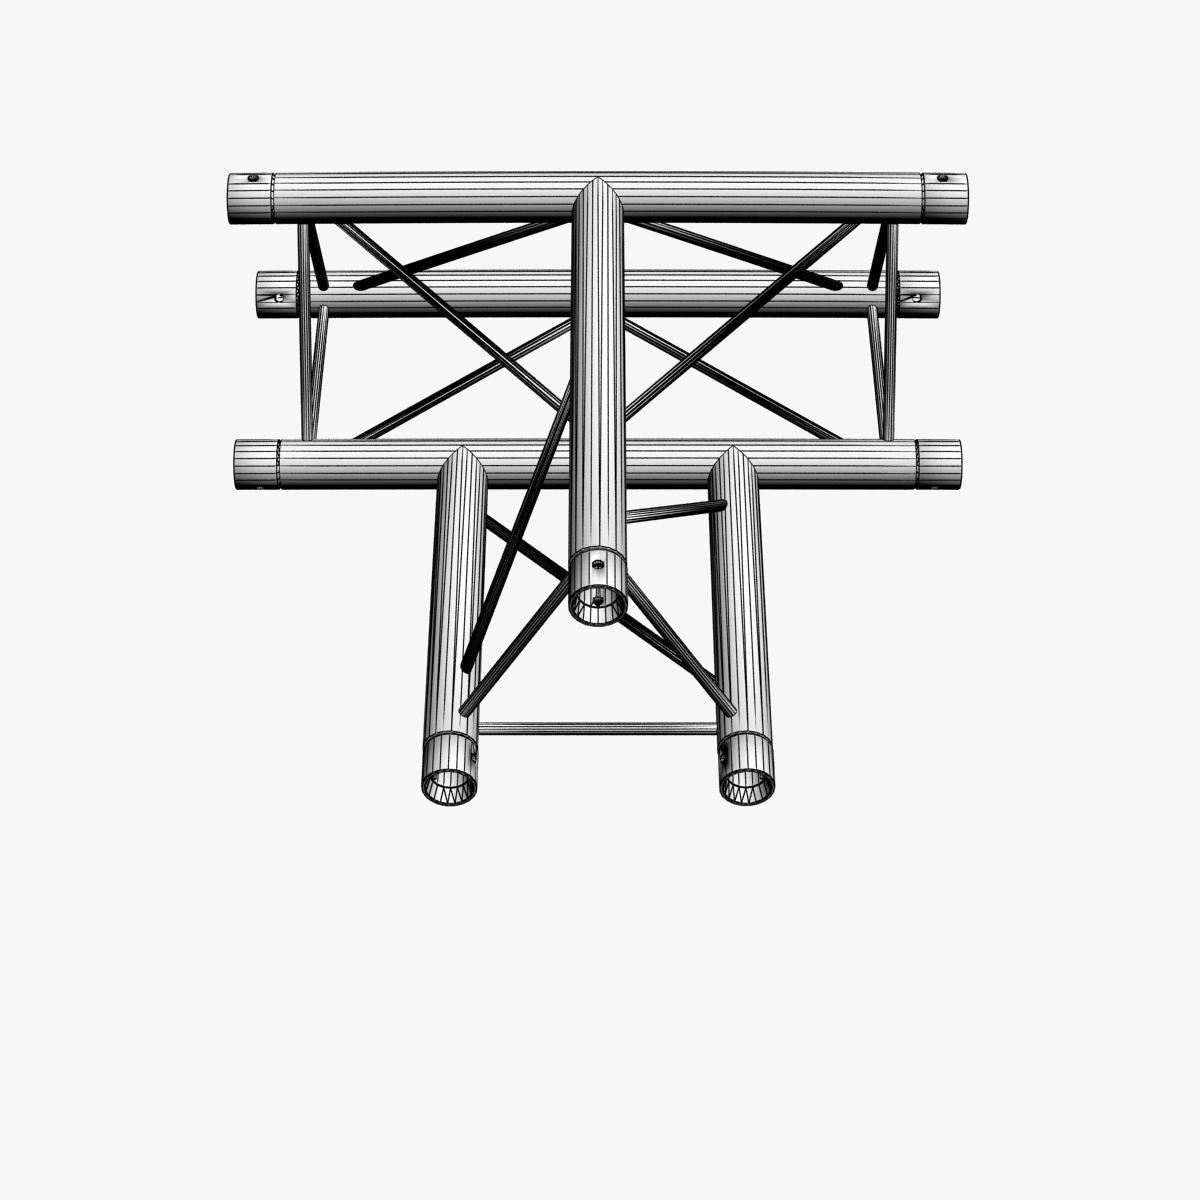 triangular trusses (collection 55 modular pieces) 3d model 3ds max dxf fbx c4d dae texture obj 216256